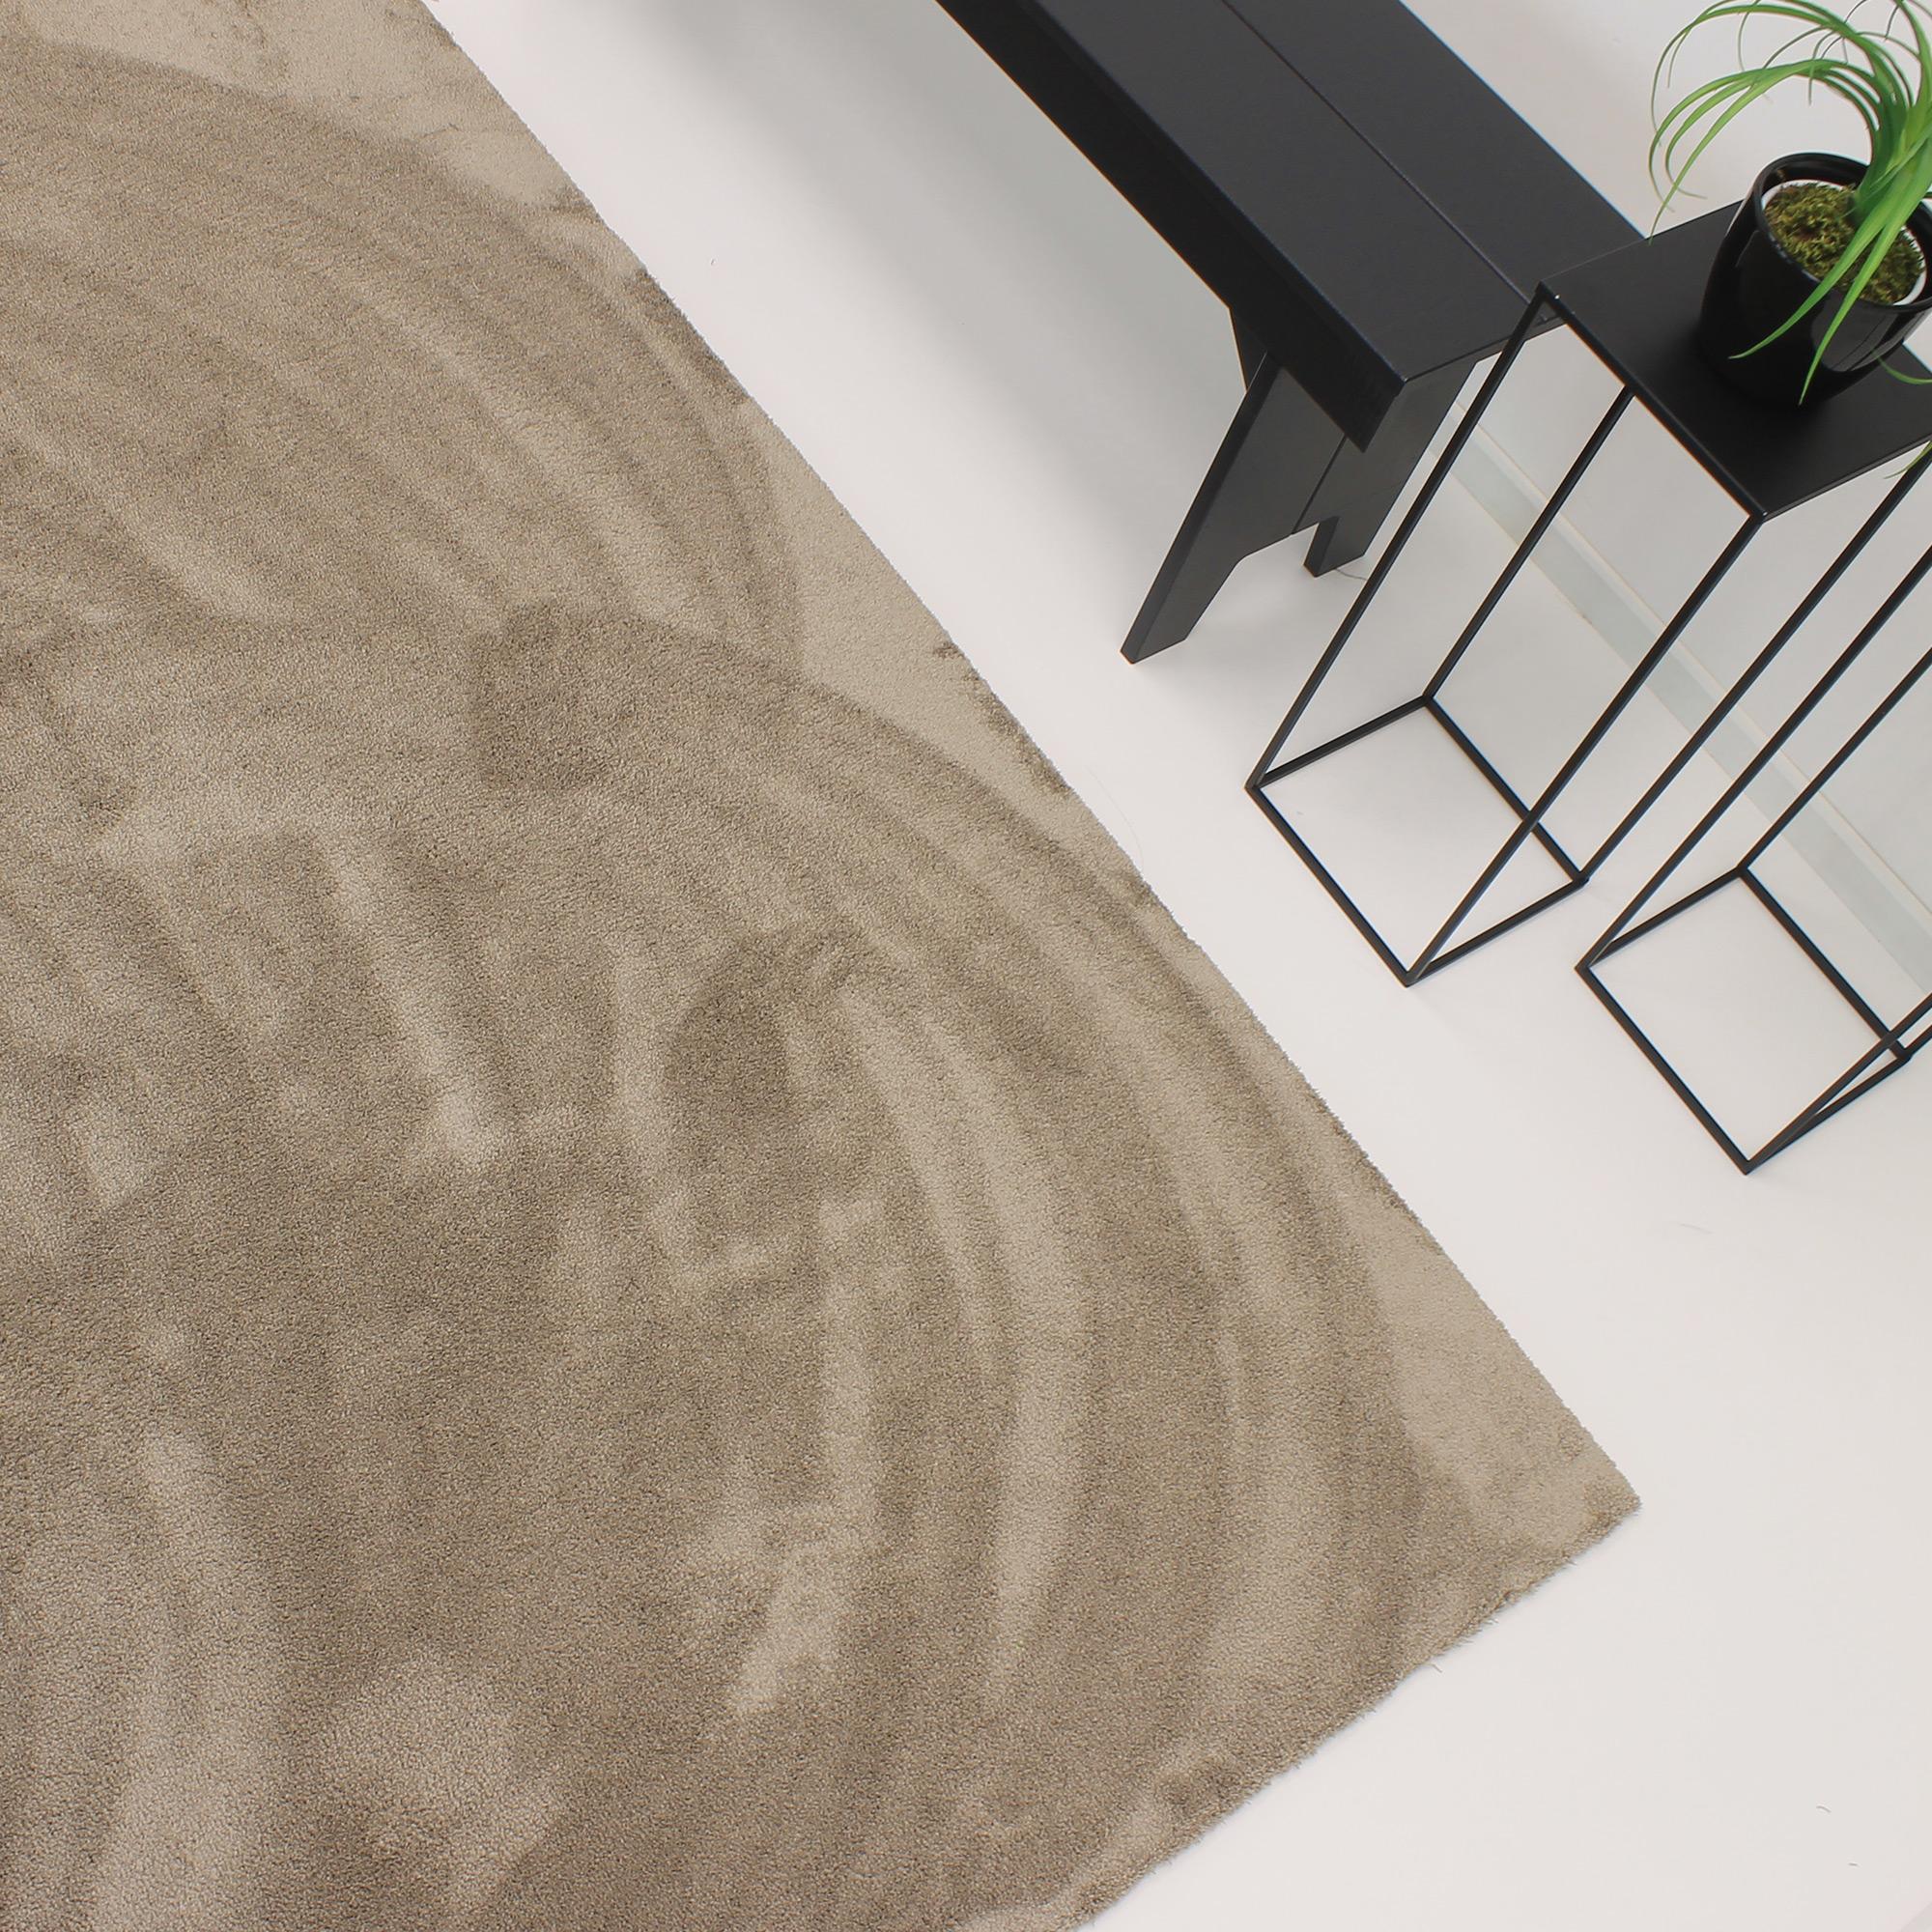 Vloerkleed Xilento Amazing Taupe | 200 x 300 cm